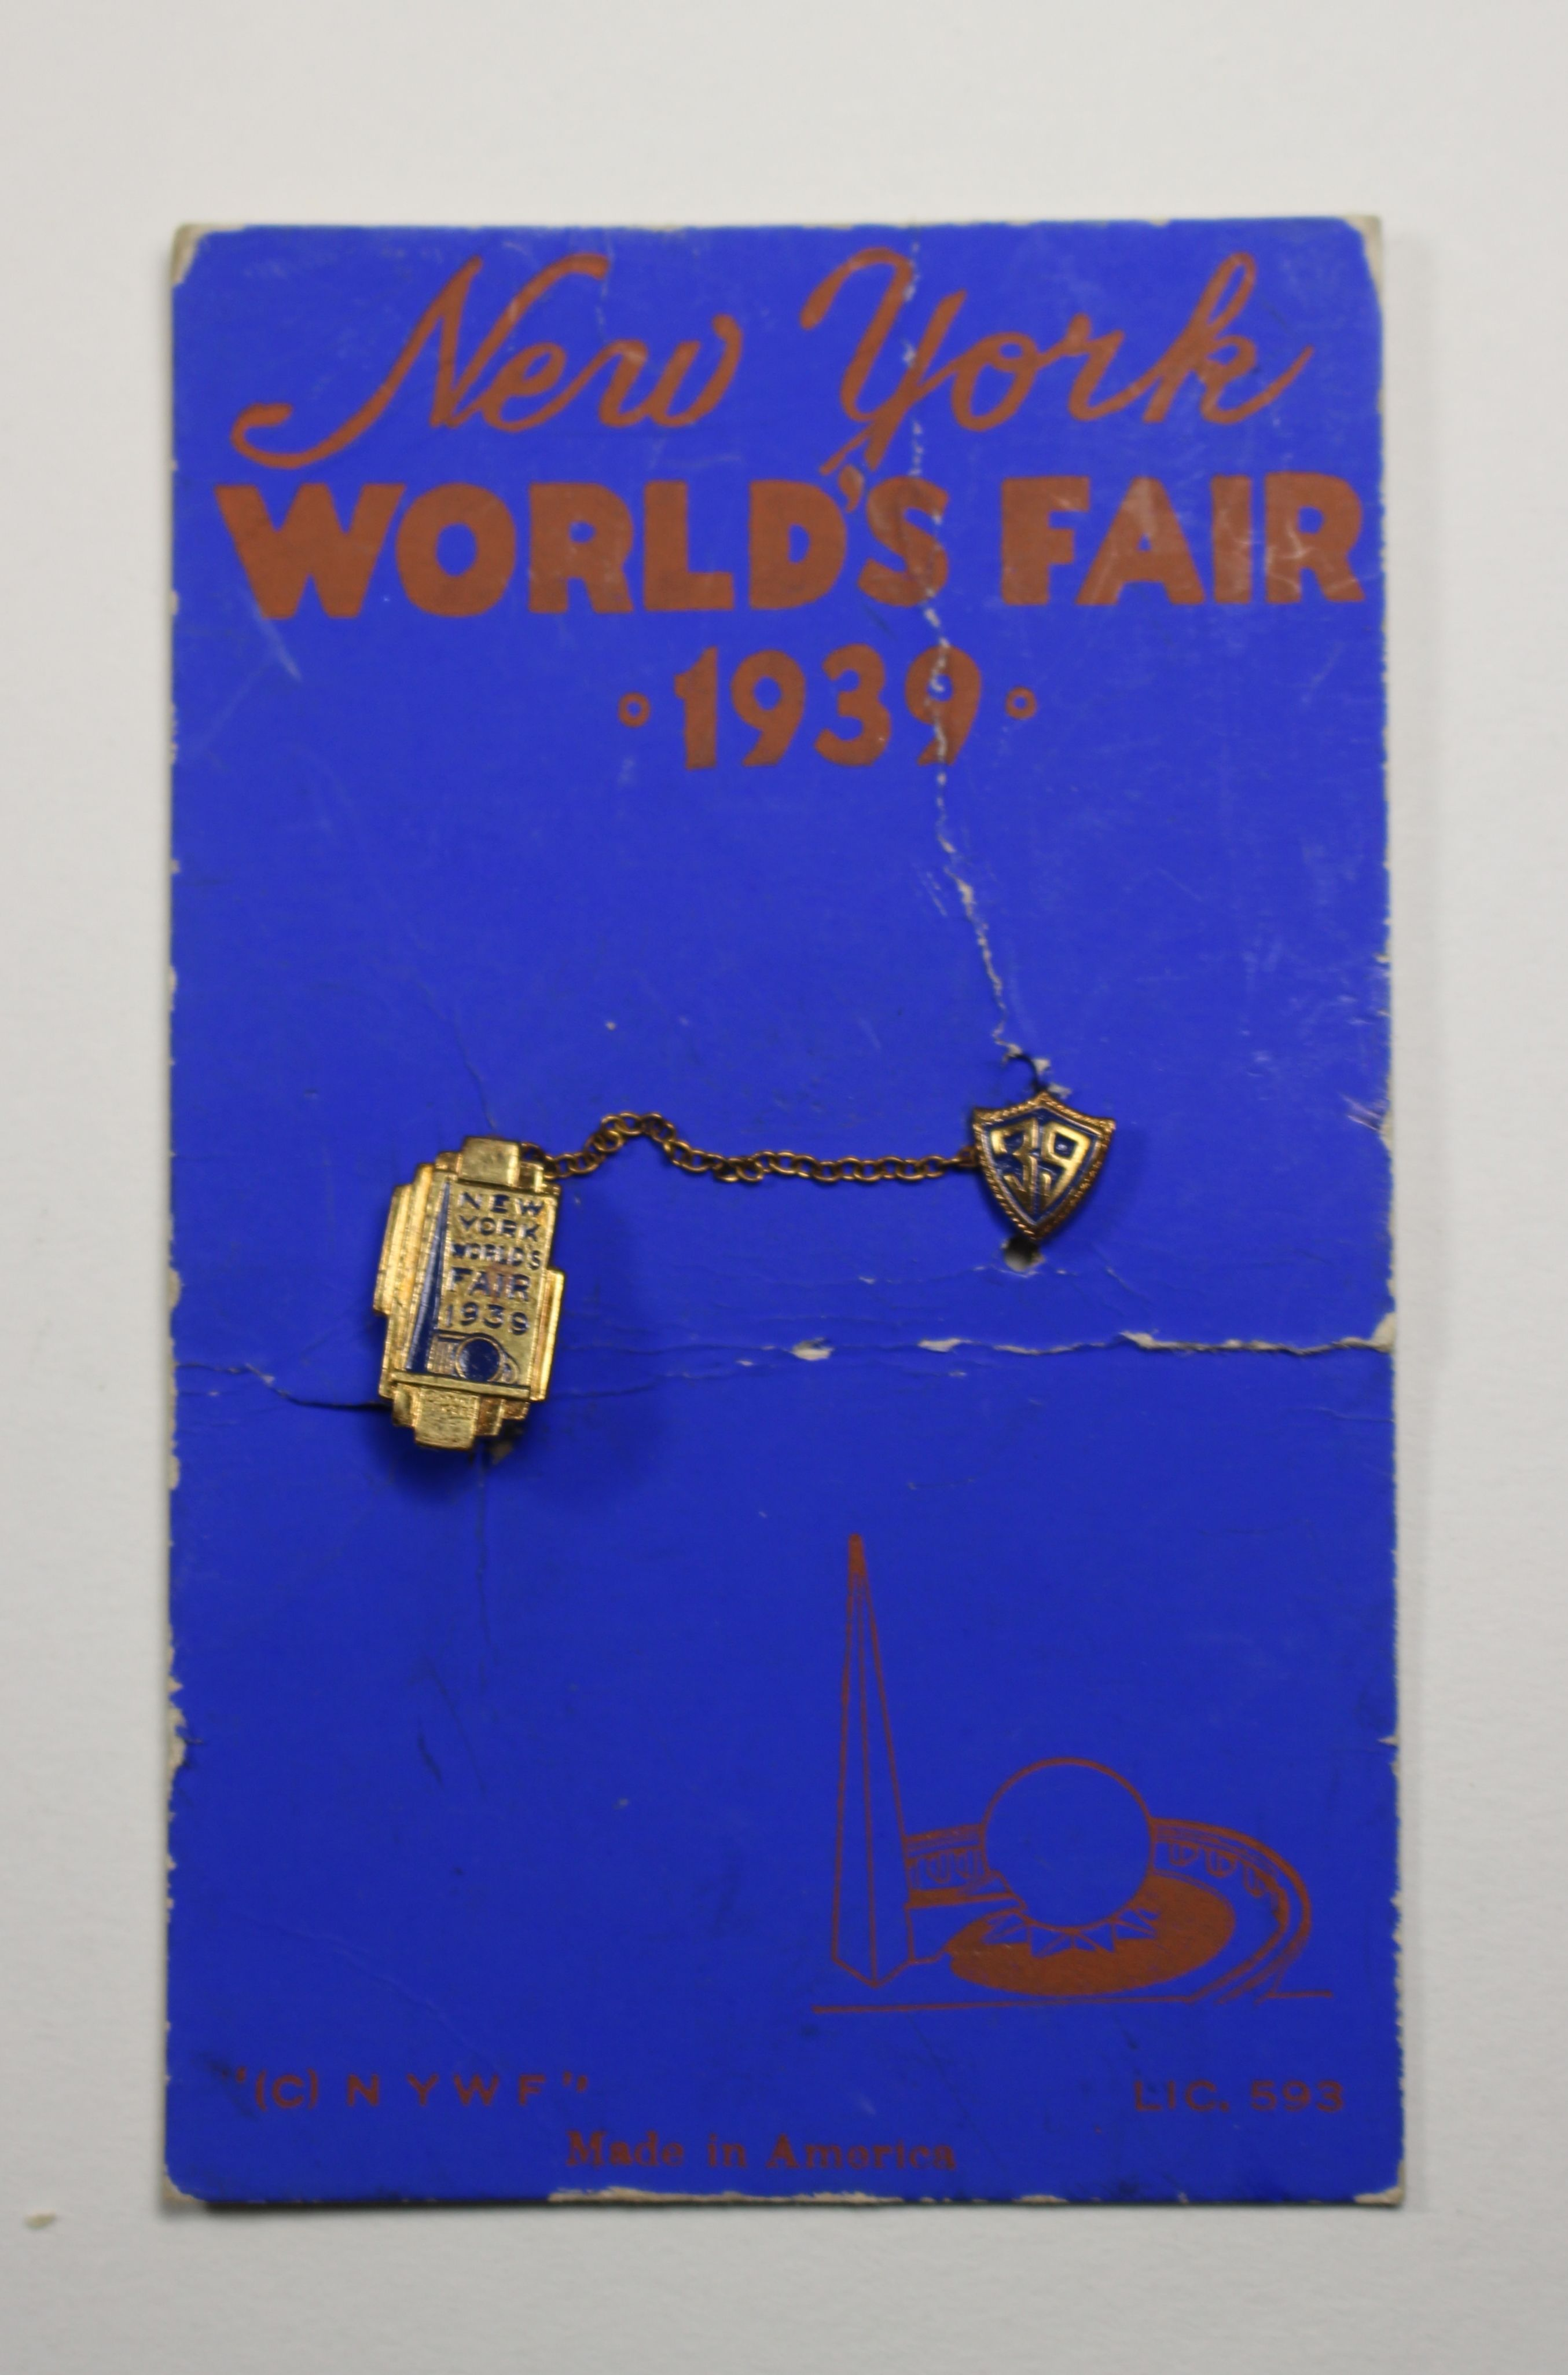 1939 New York World's Fair Pin On Original Card